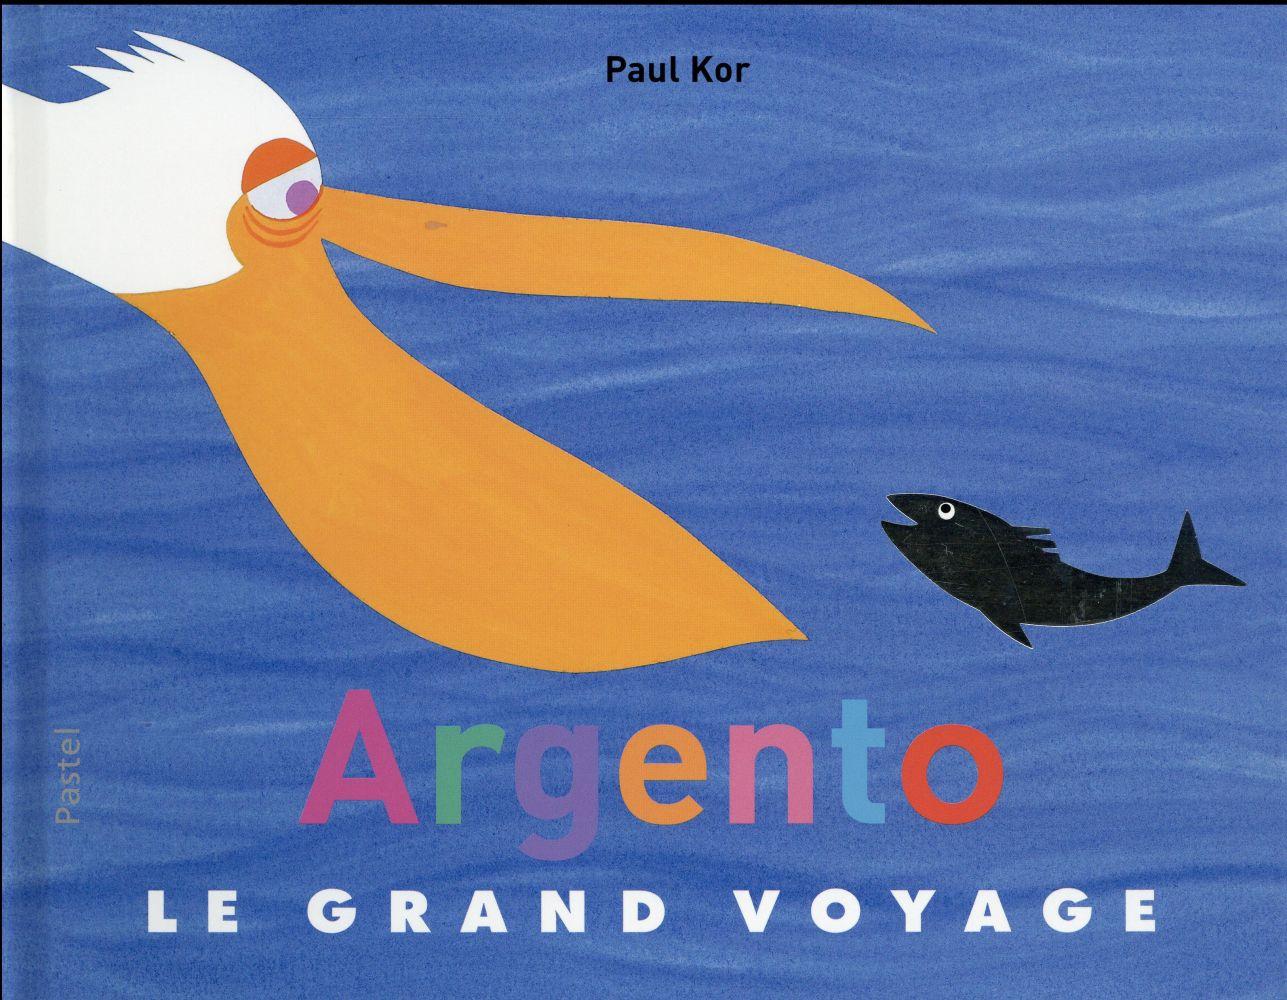 ARGENTO LE GRAND VOYAGE